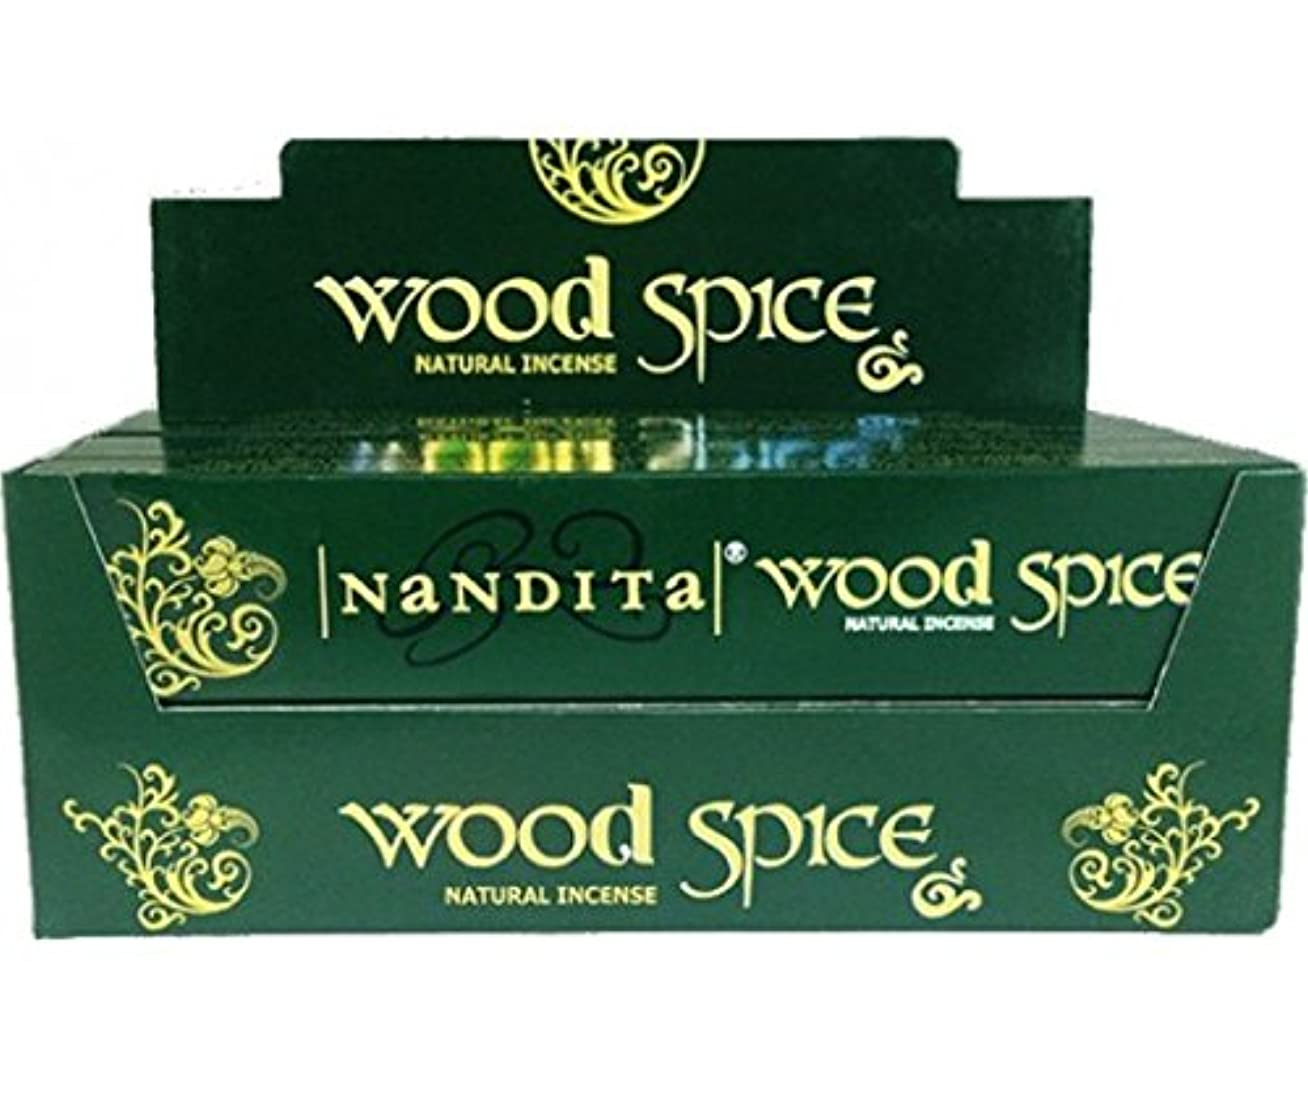 Nandita Wood Spice Incense Sticks 12 x 15 gms Agarbathi